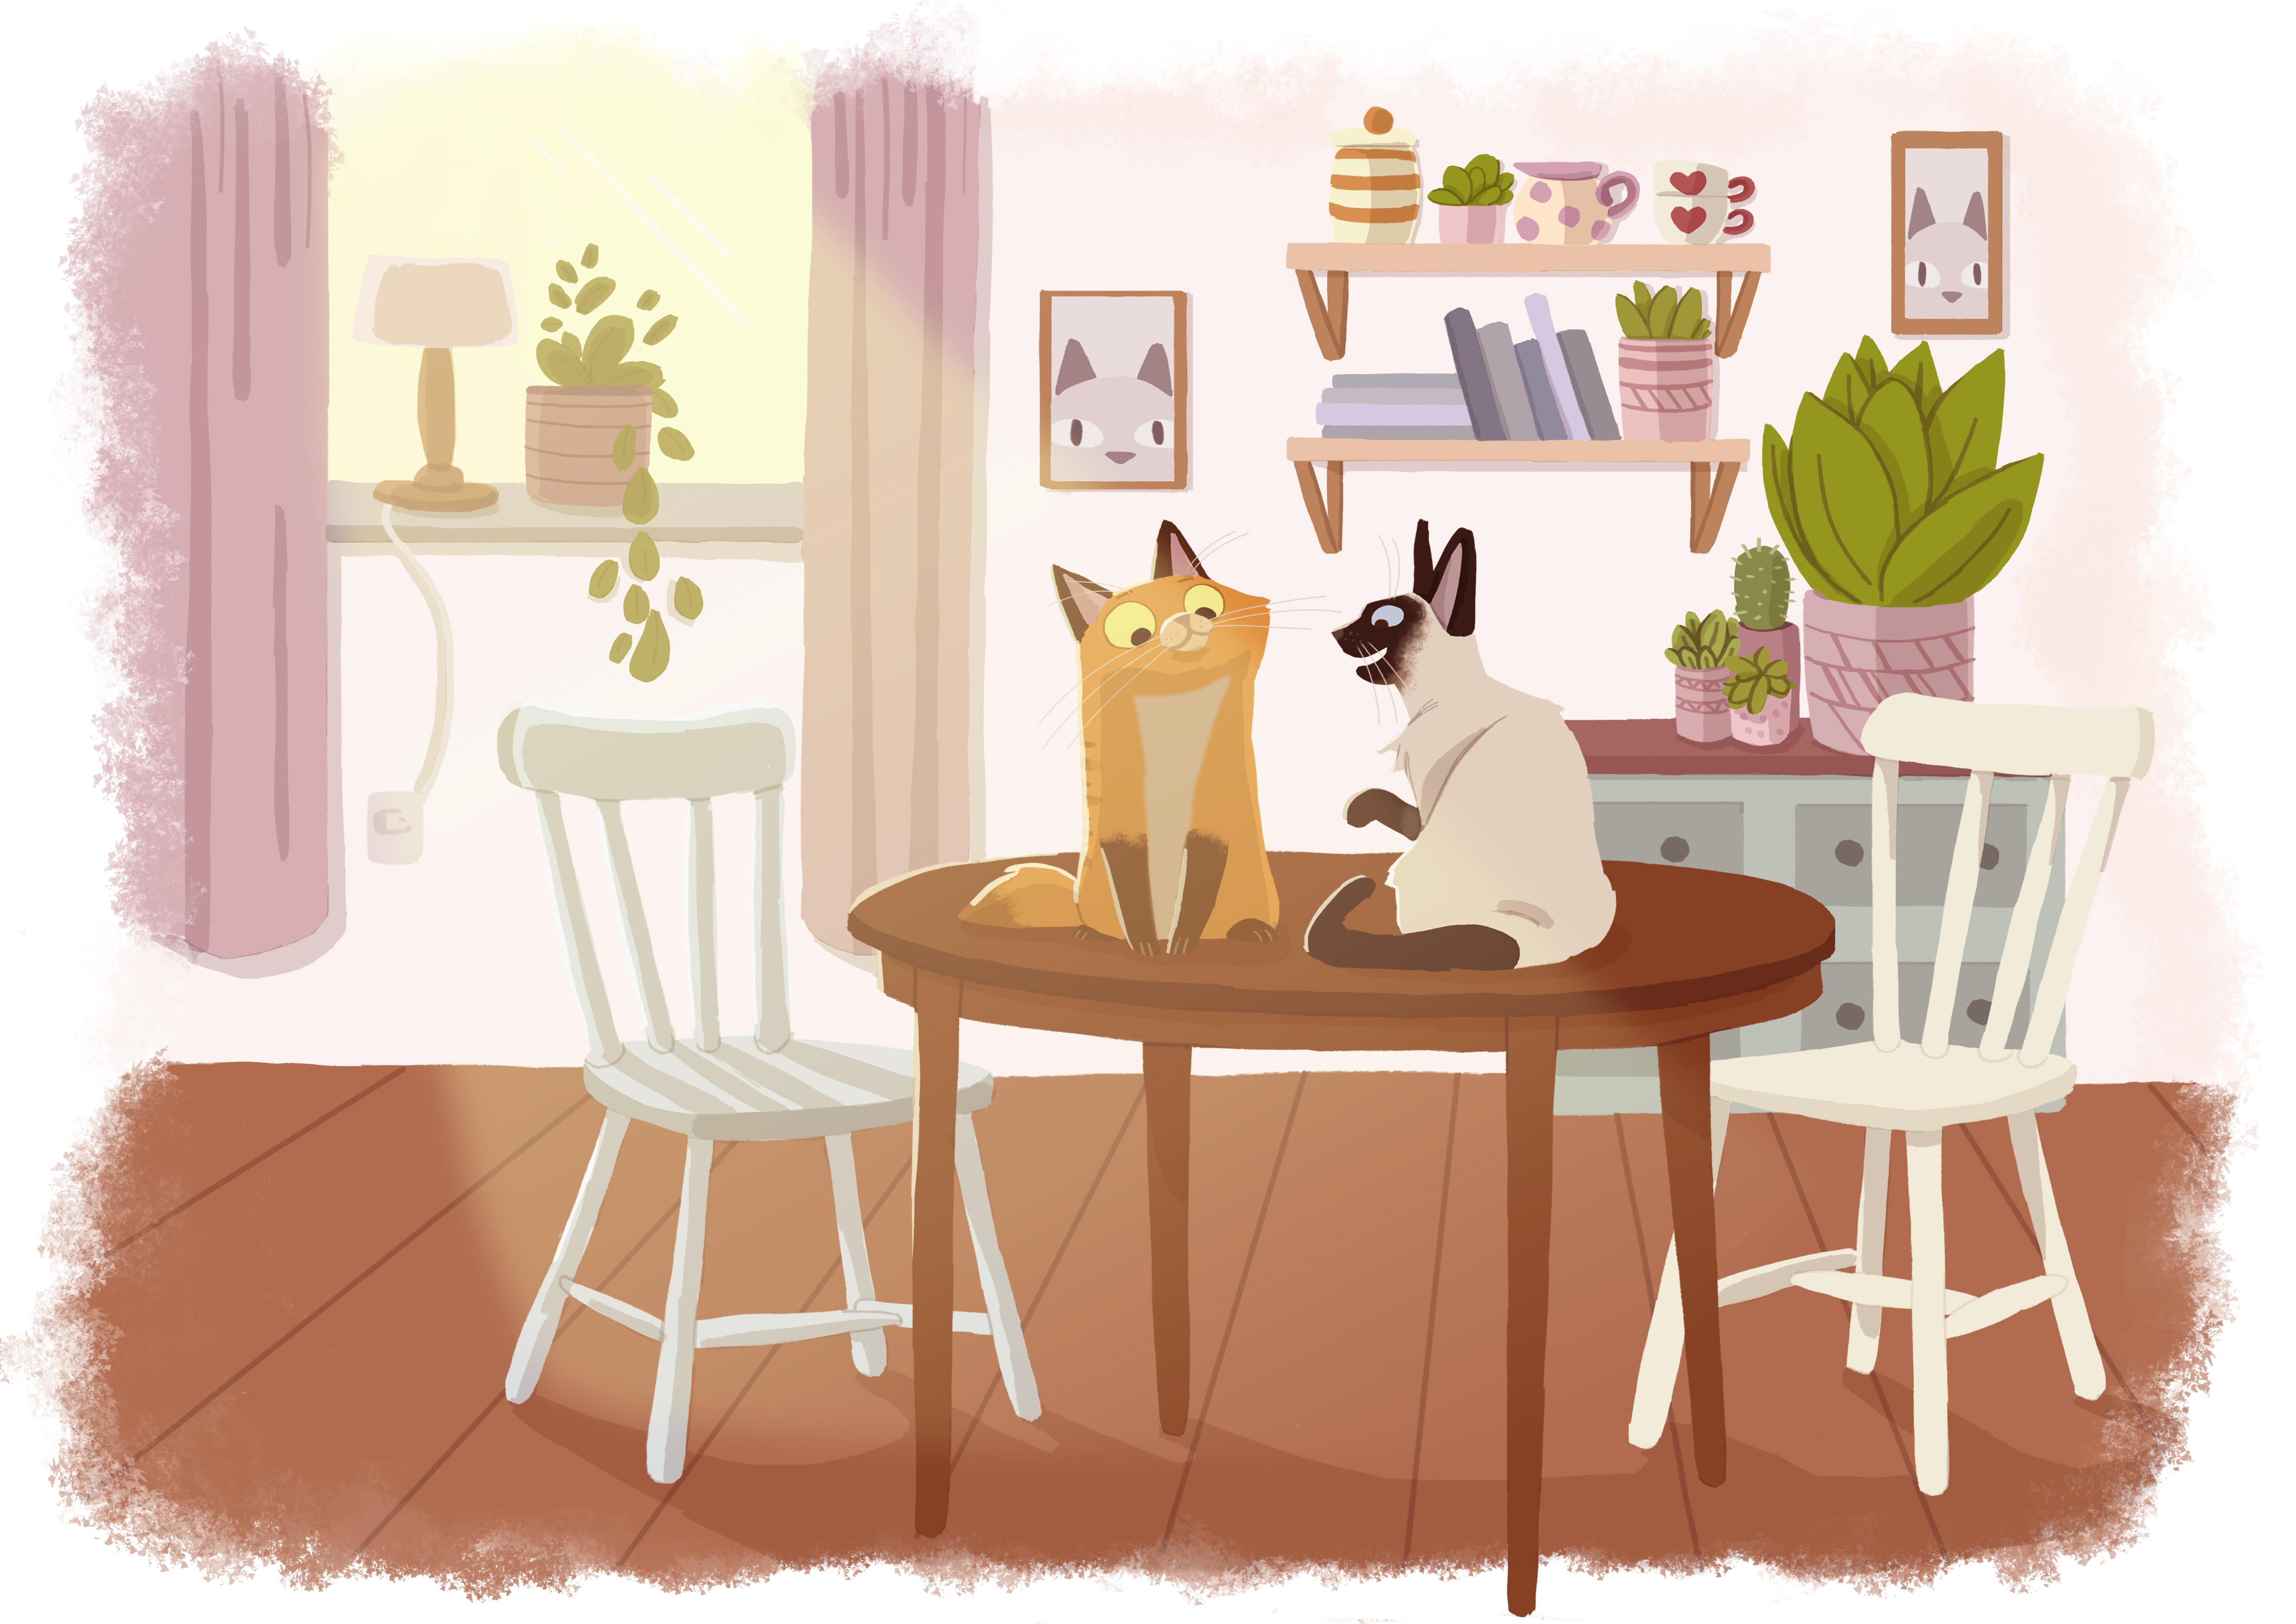 et bord Der sad to katte på et bord et bord